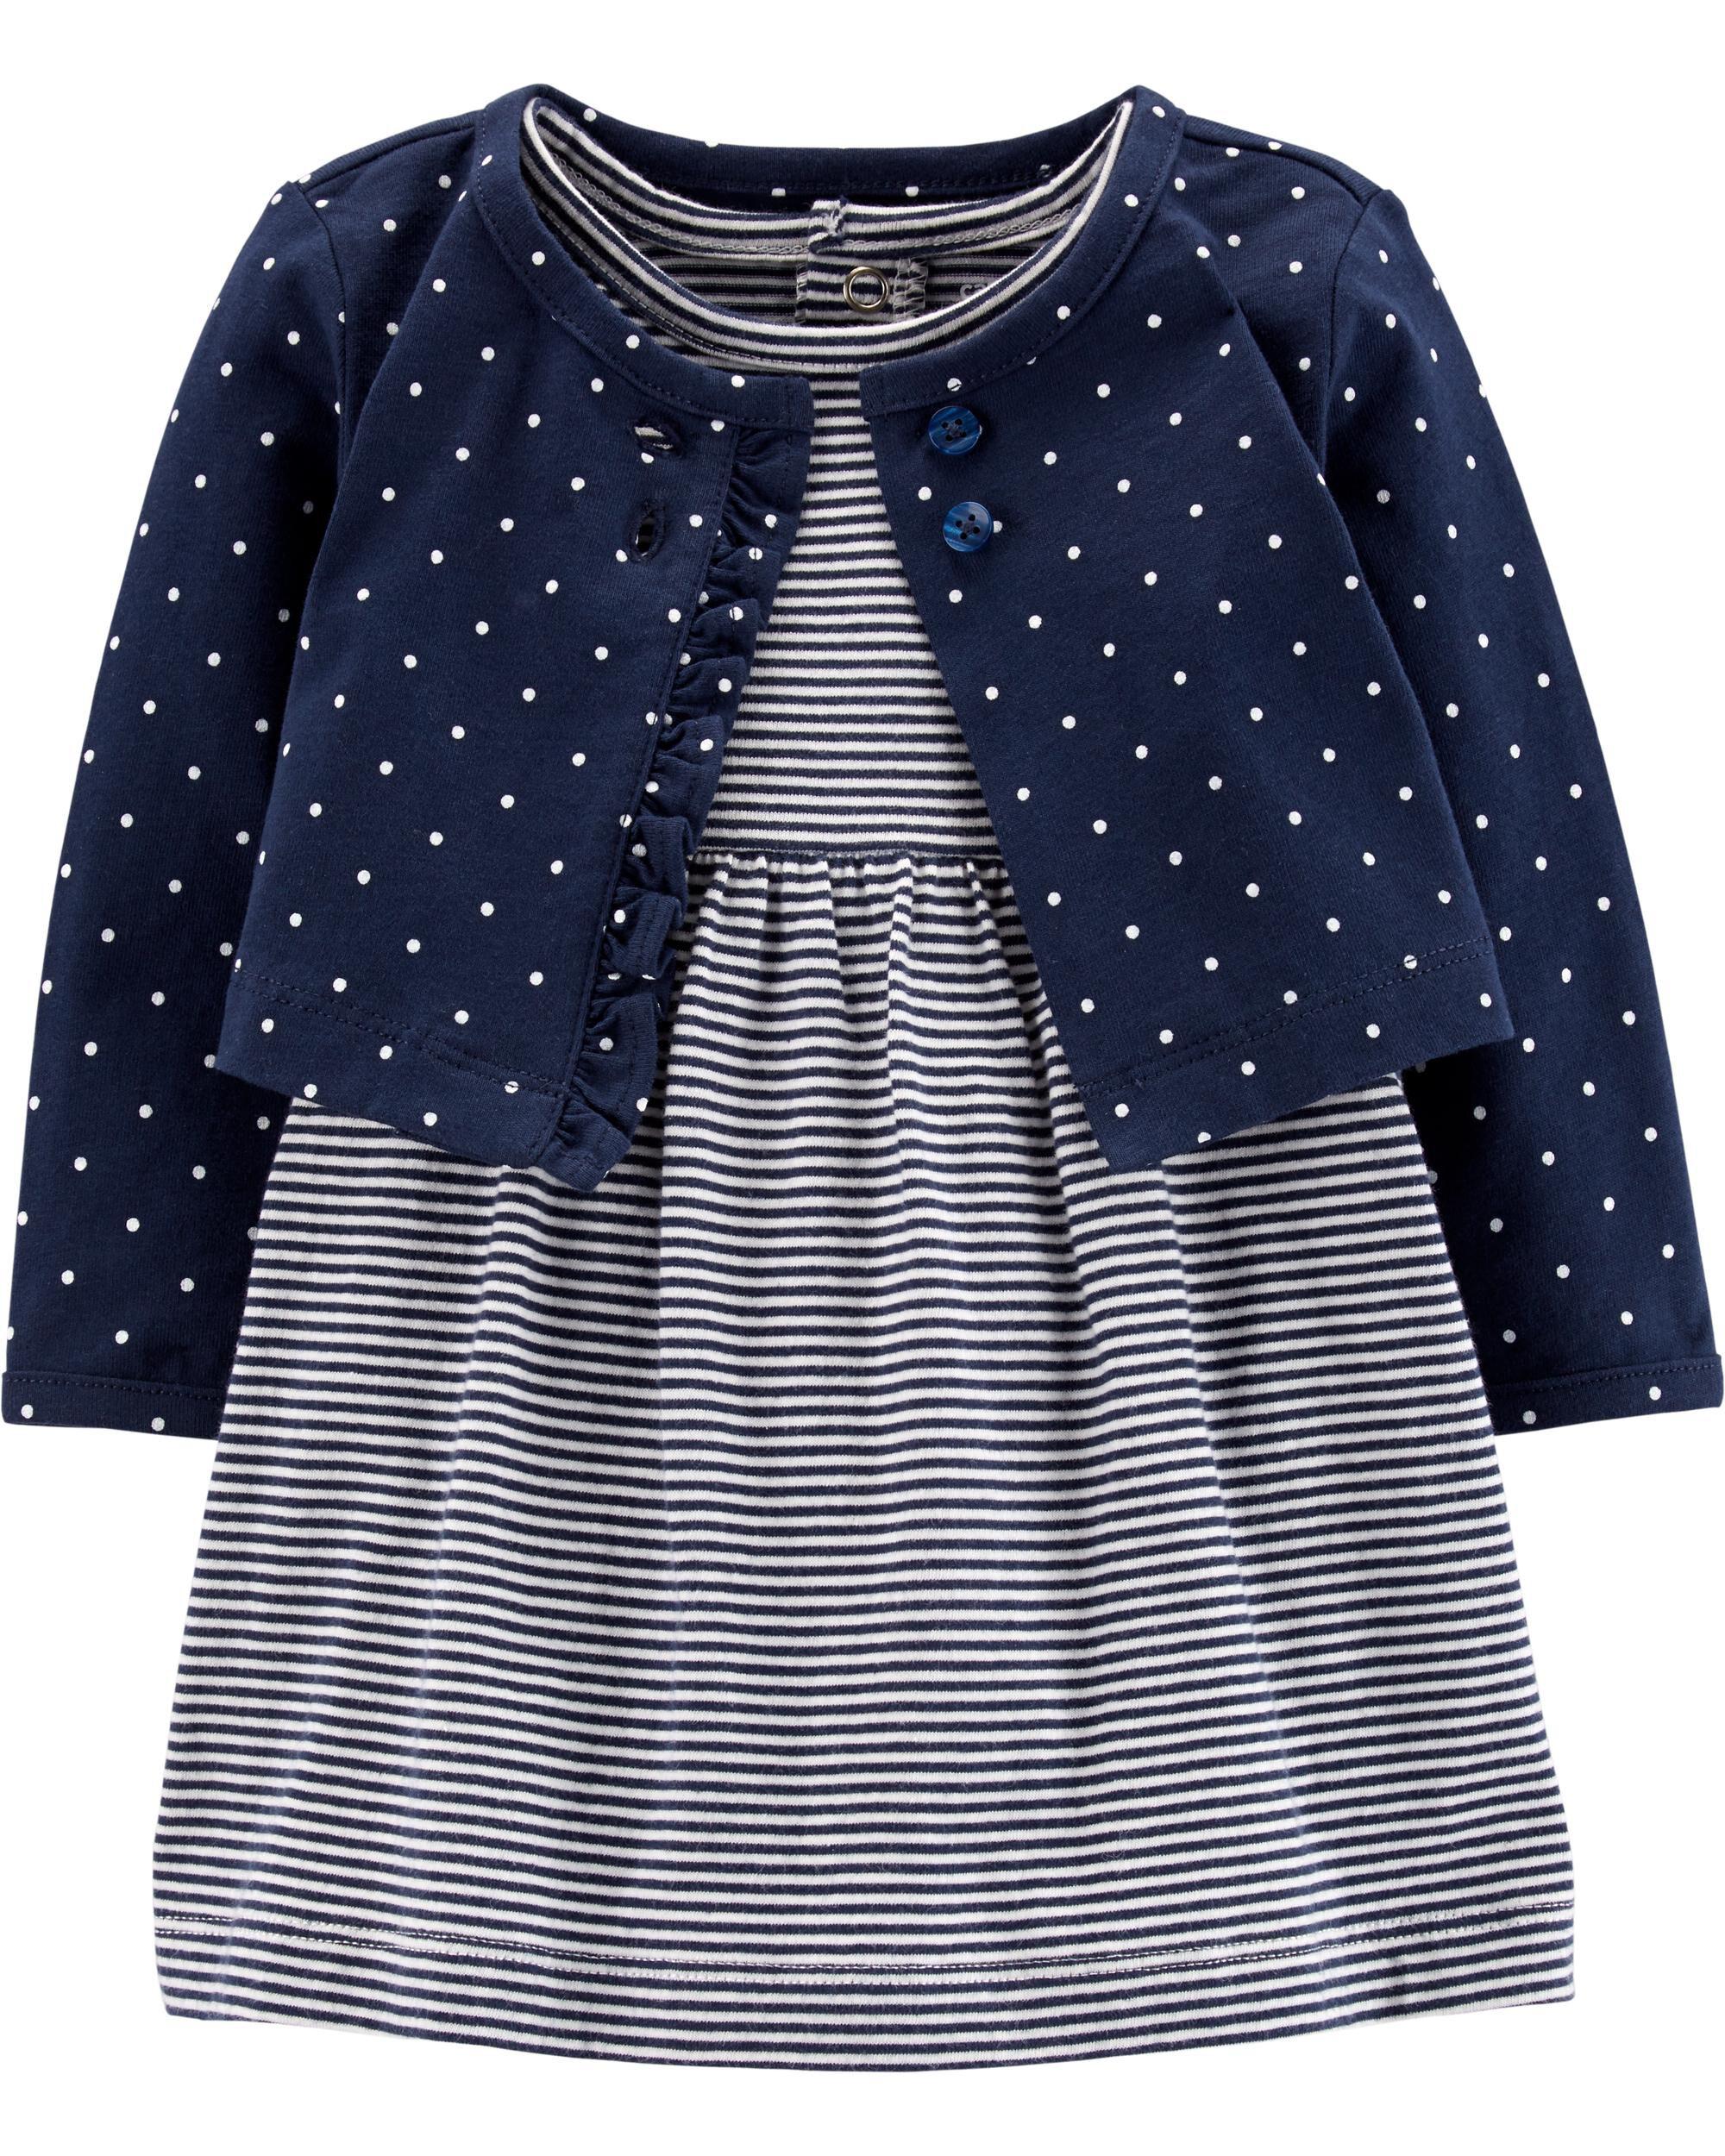 3Pcs New Baby Girl Clothes Anchor Sleeveles Topspolka Dots Briefs Fashion